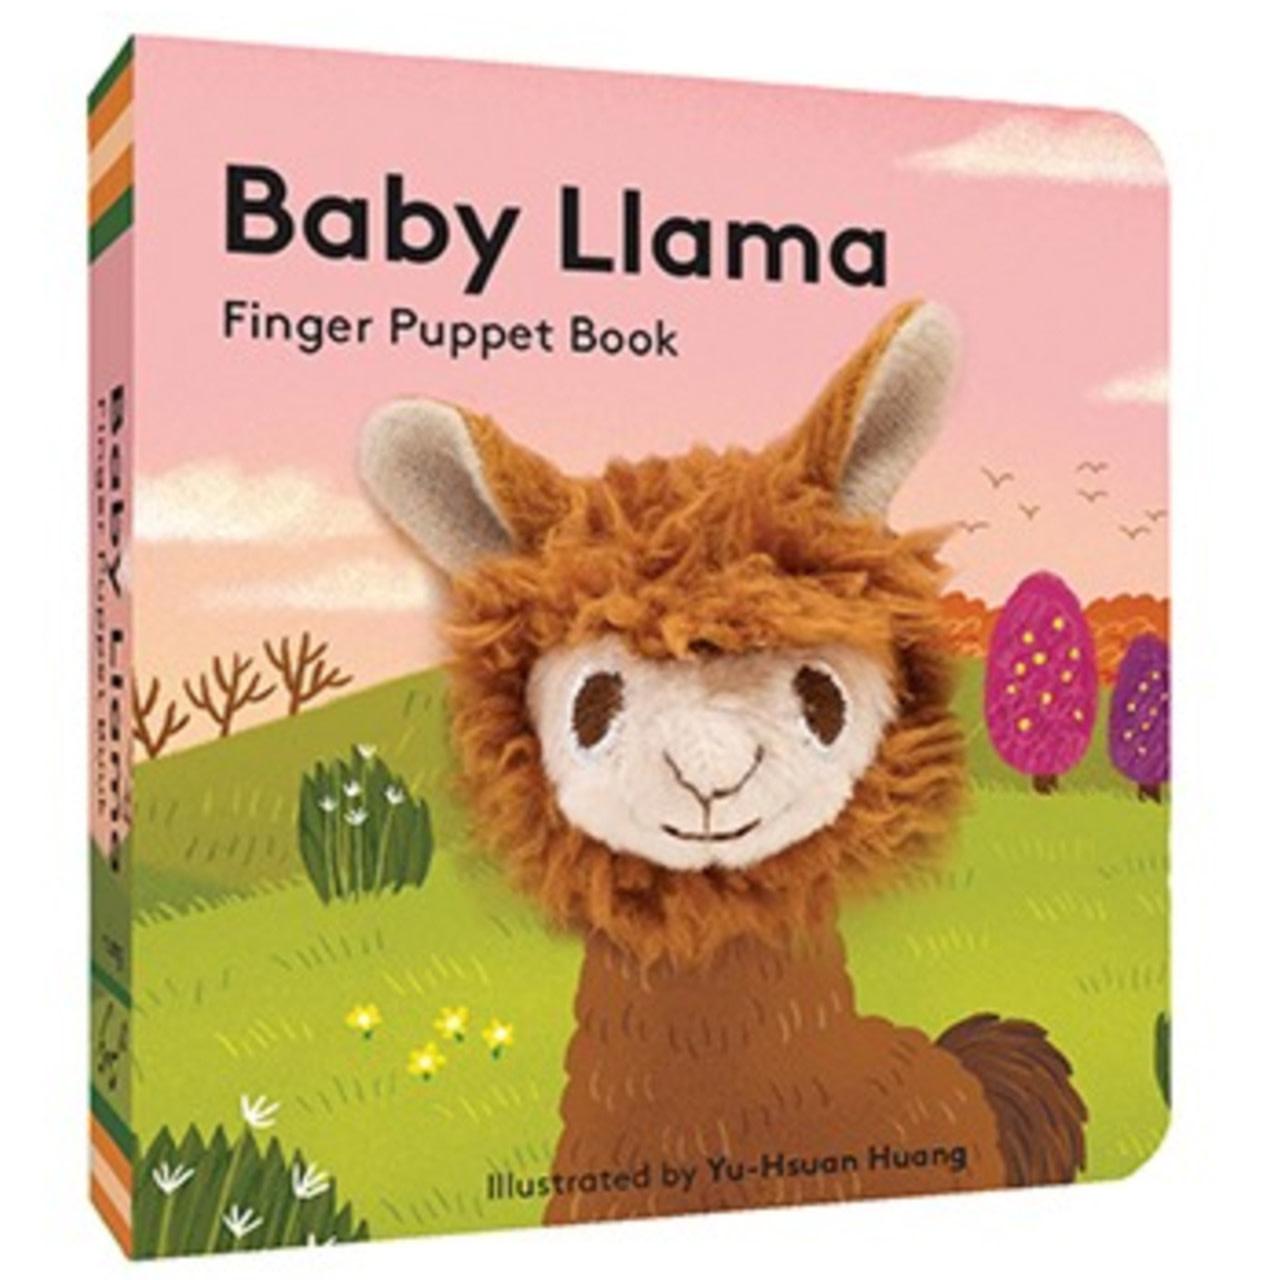 Finger Puppet Book: Baby Llama